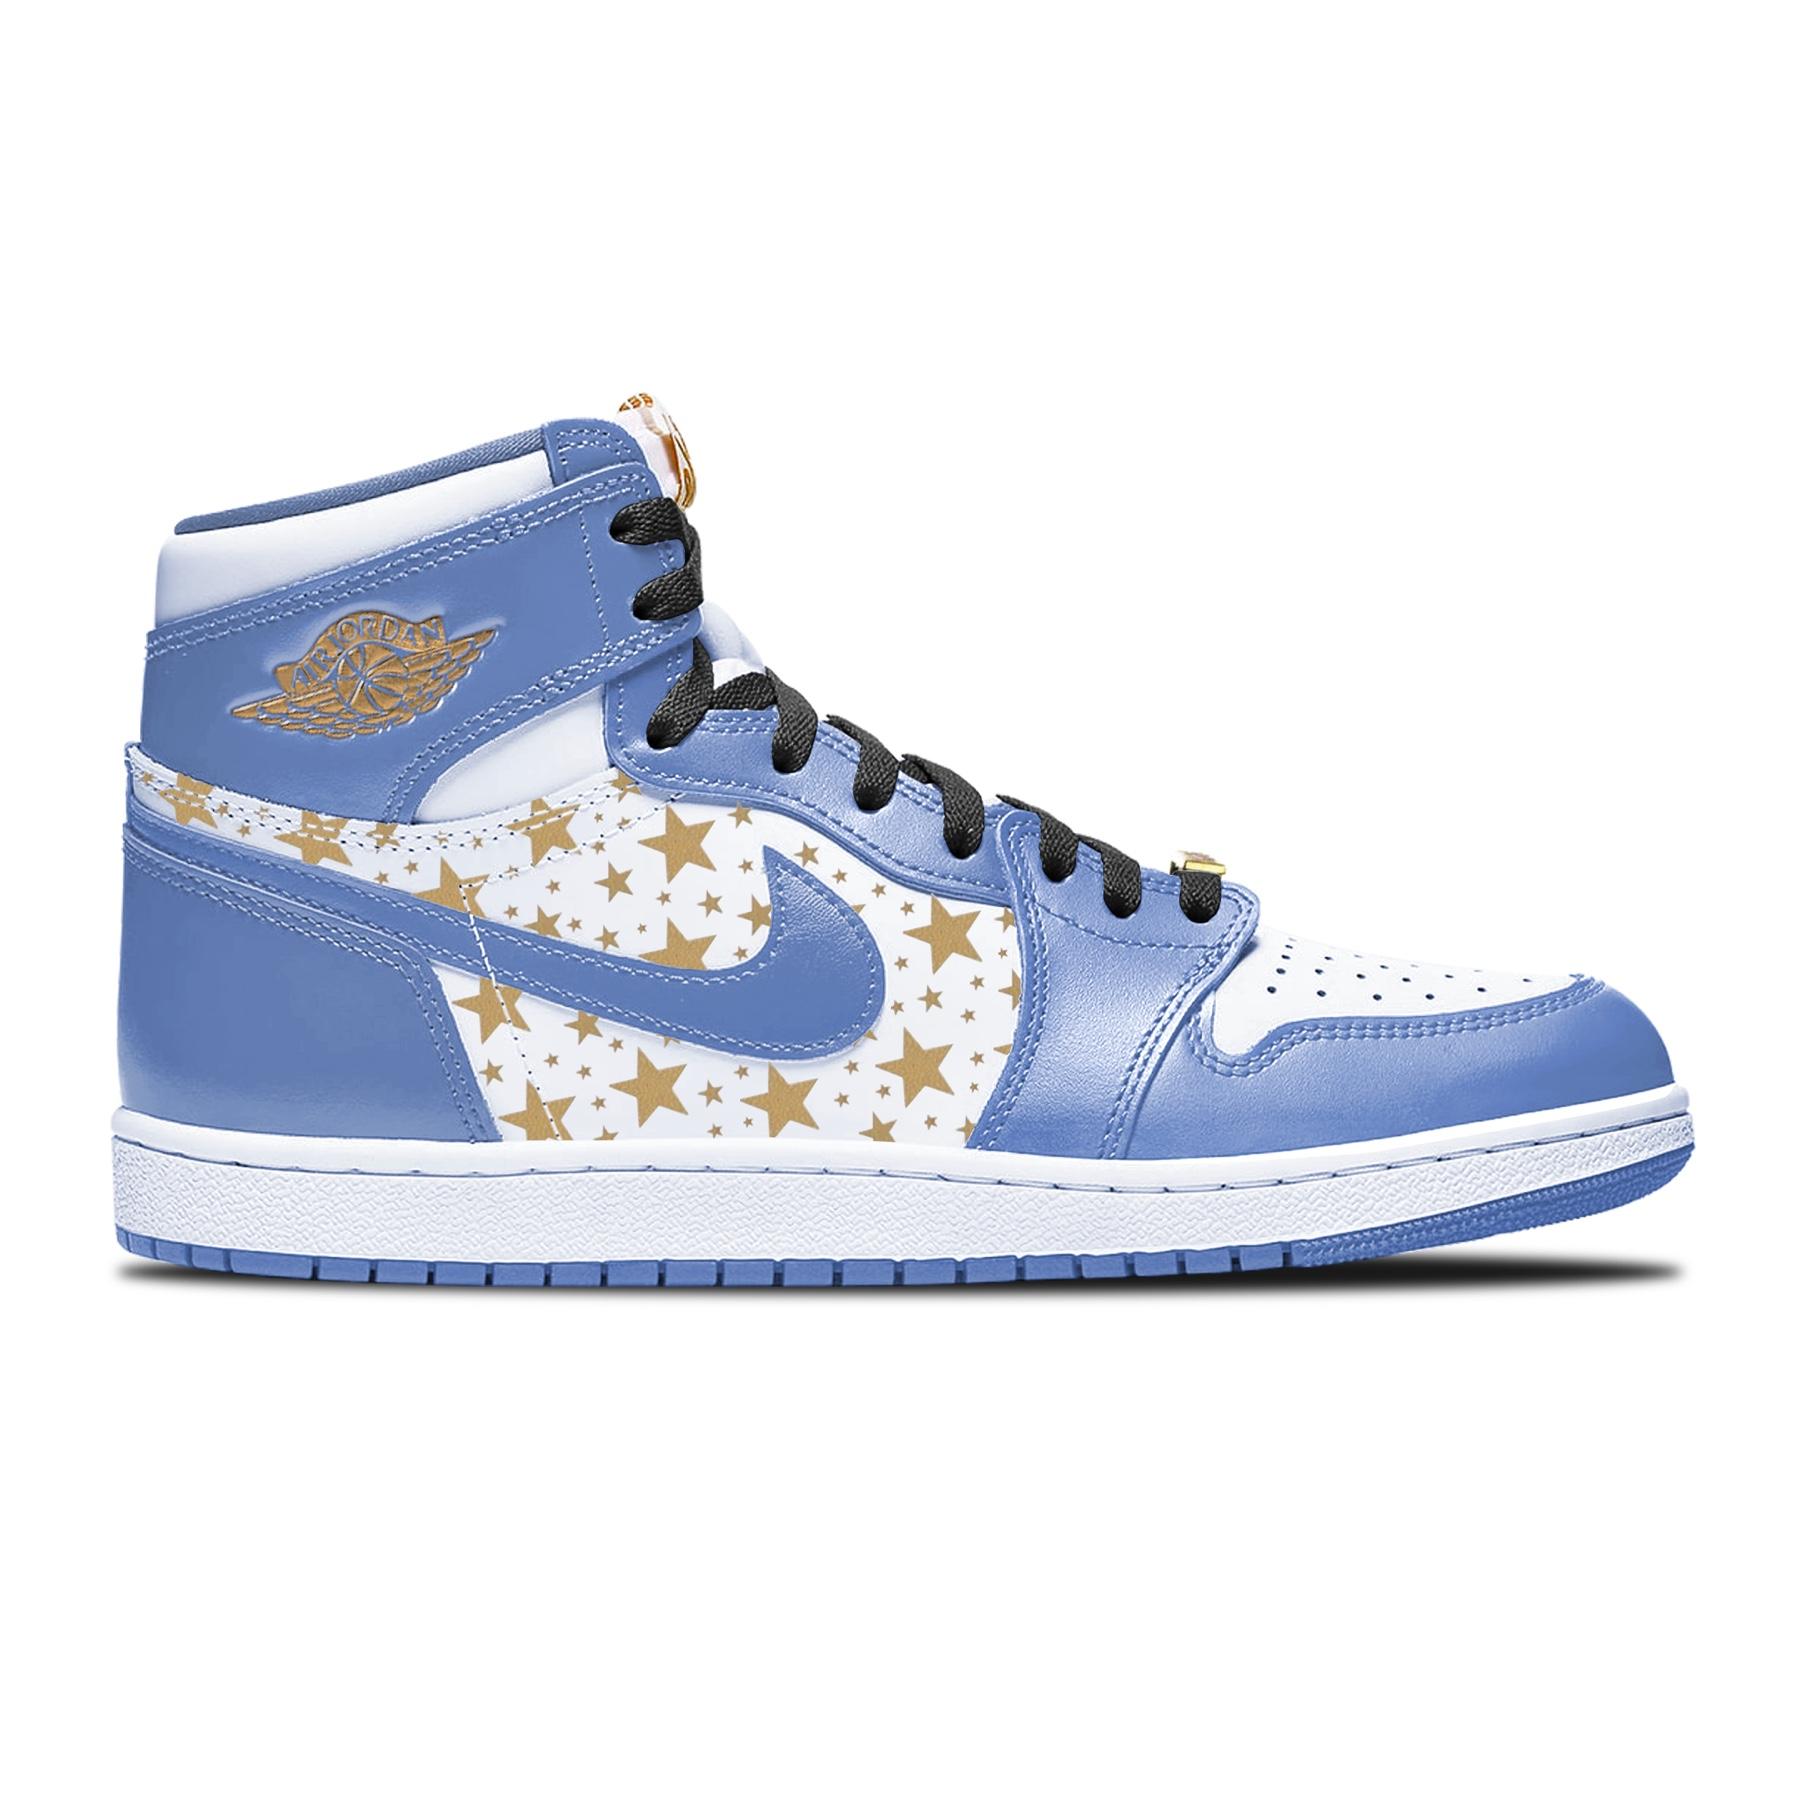 Supreme x Air Jordan 1 High azzurra pattern stellato